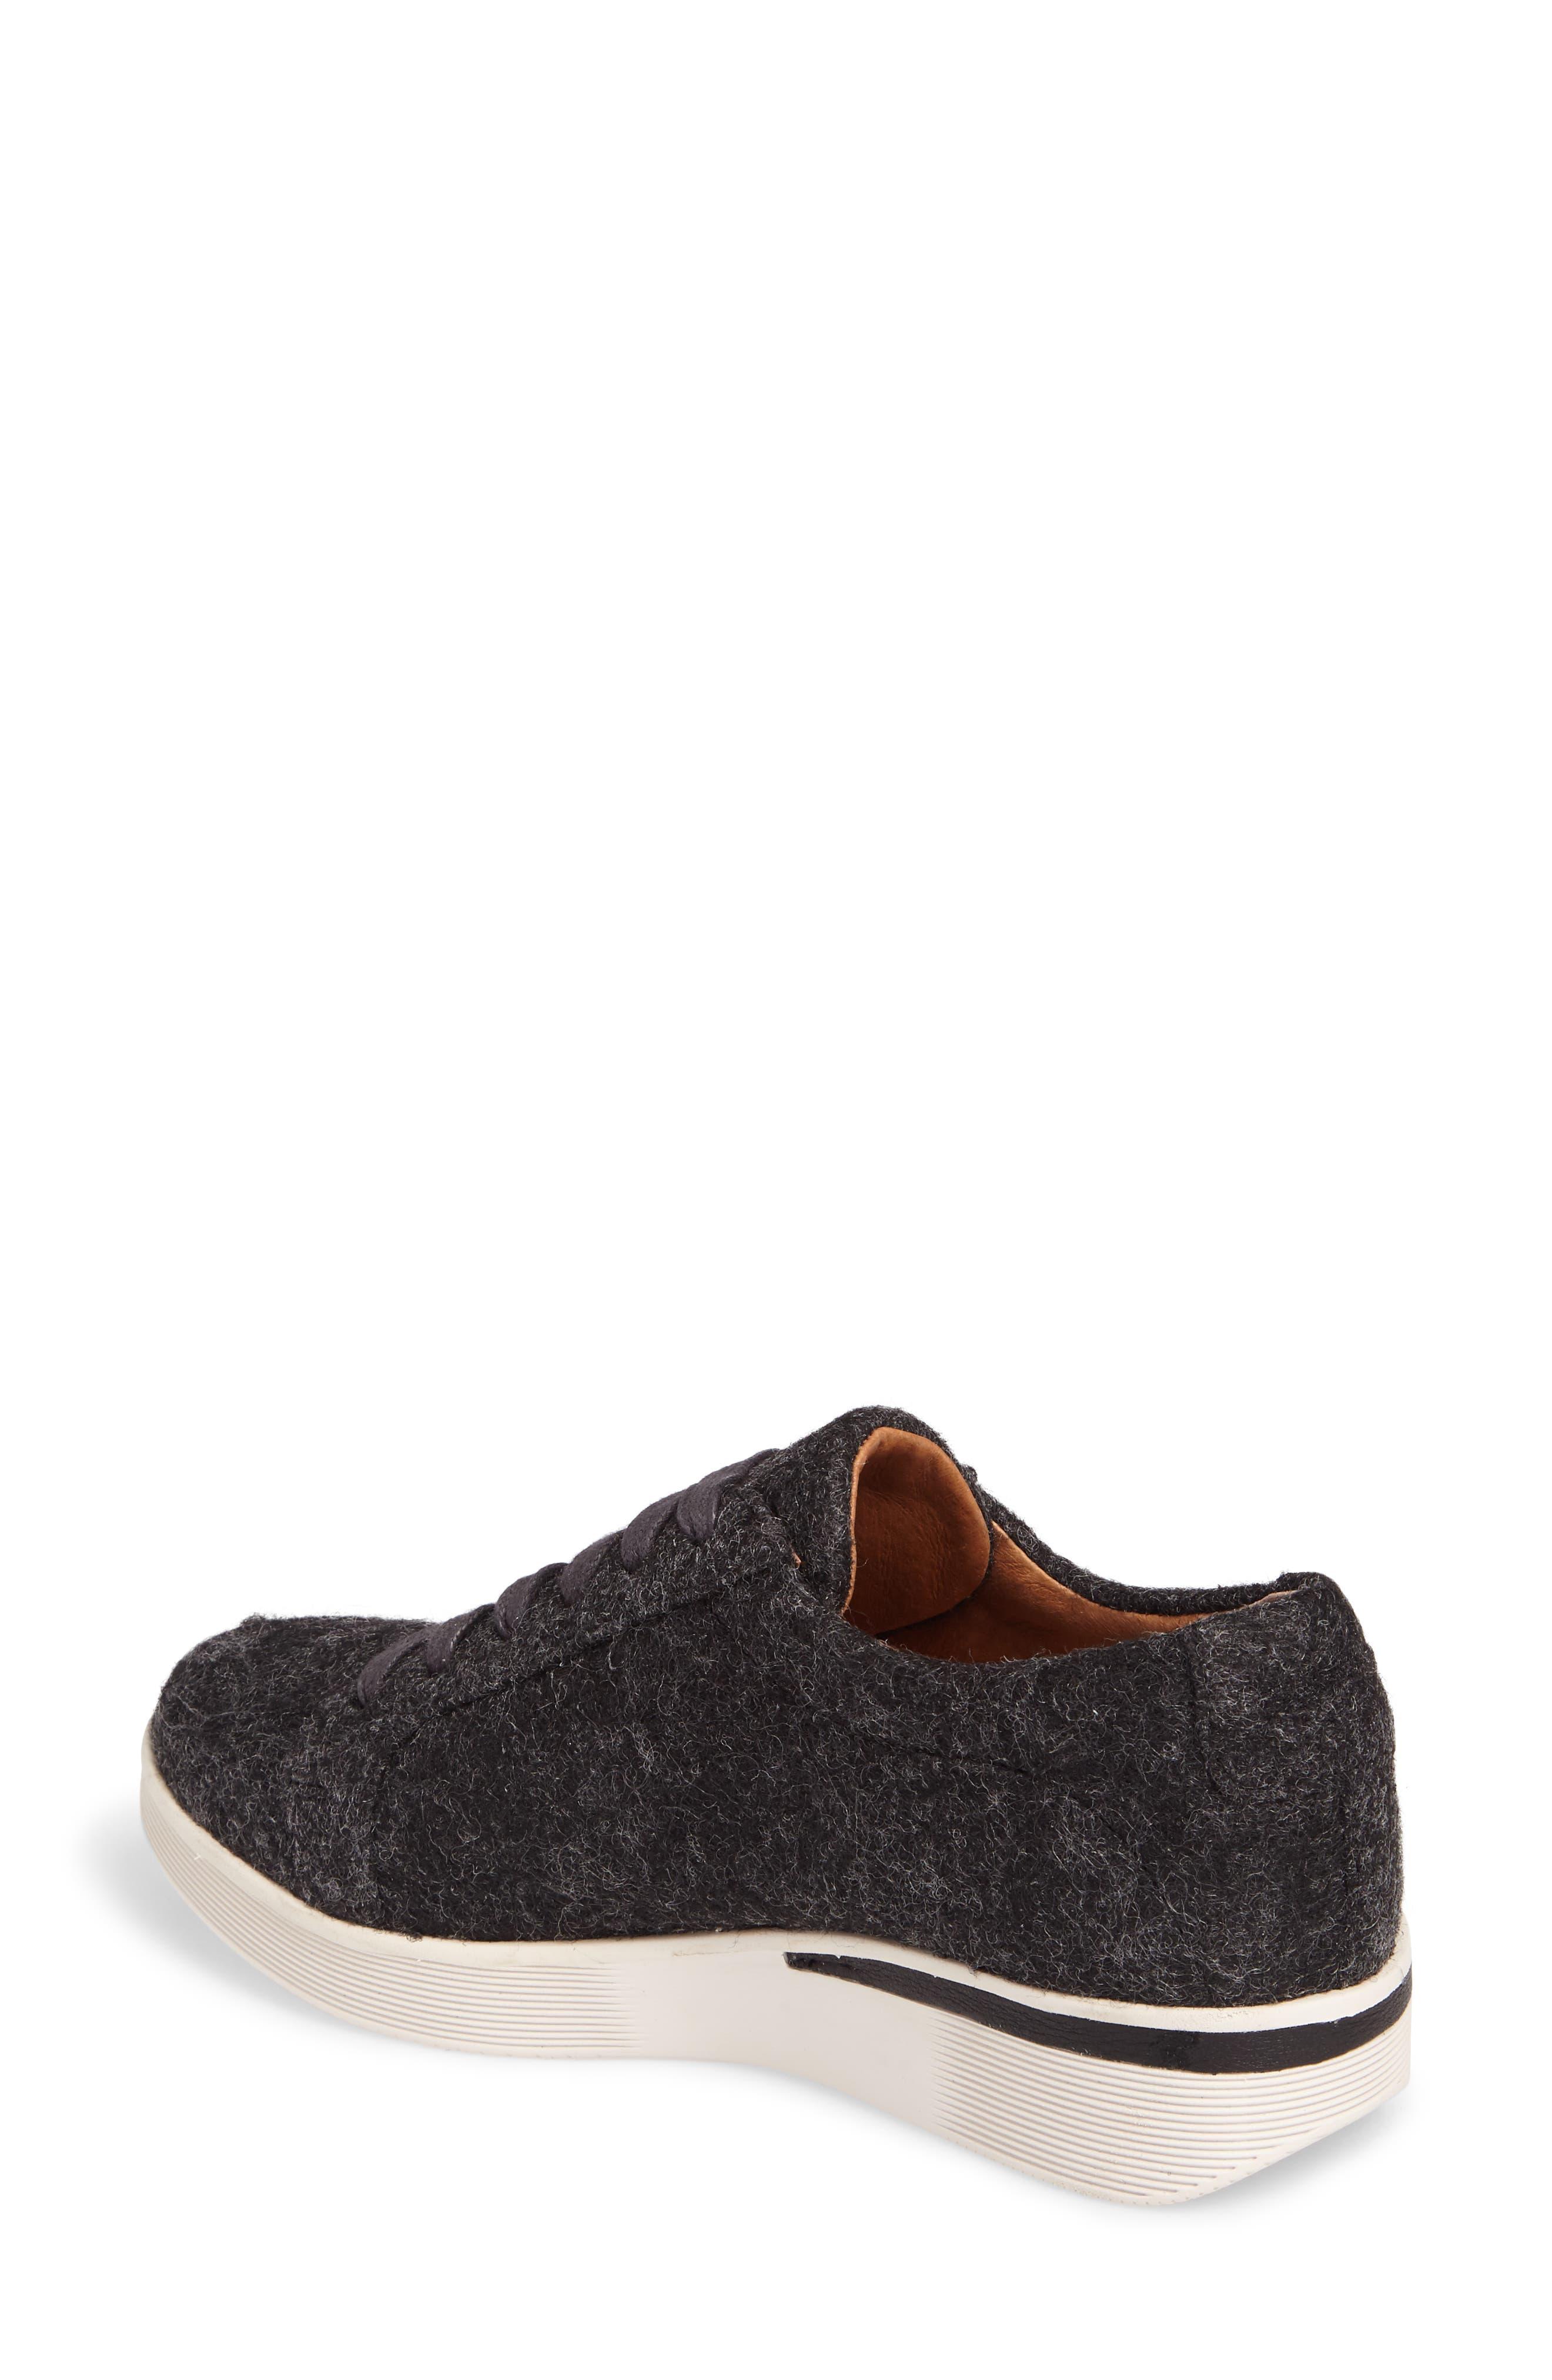 GENTLE SOULS BY KENNETH COLE, Haddie Low Platform Sneaker, Alternate thumbnail 2, color, HEATHER GREY WOOL